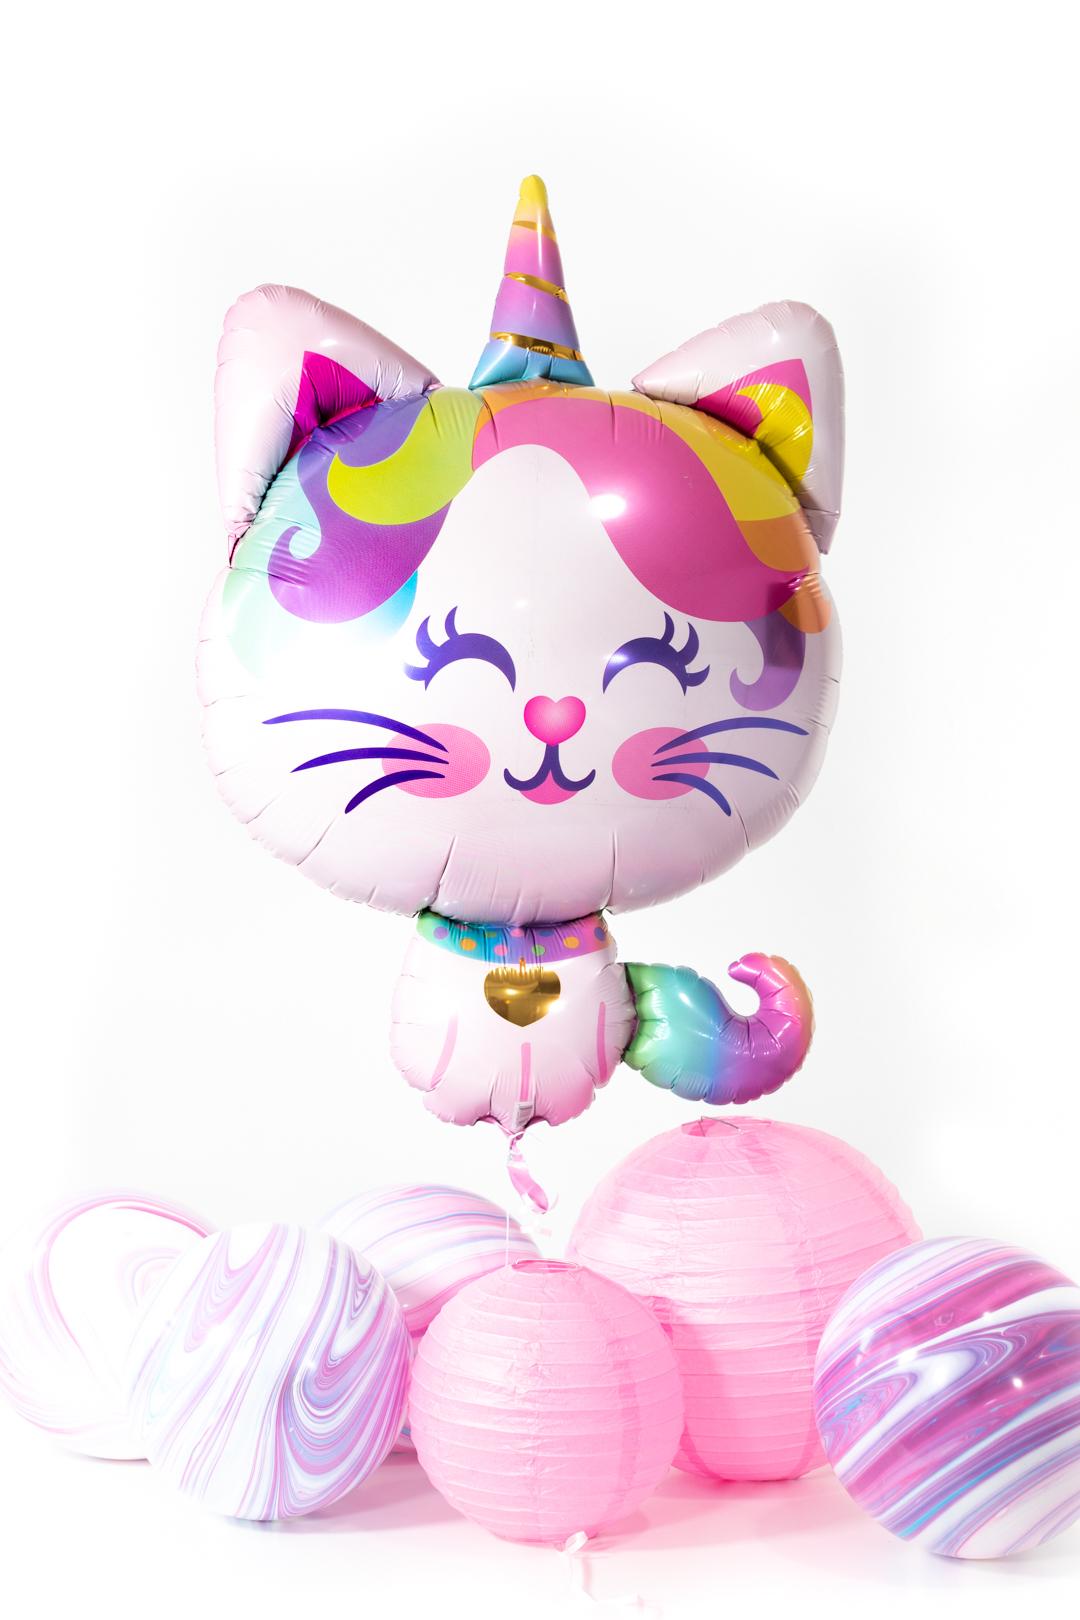 caticorn mylar balloon for caticorn themed parties